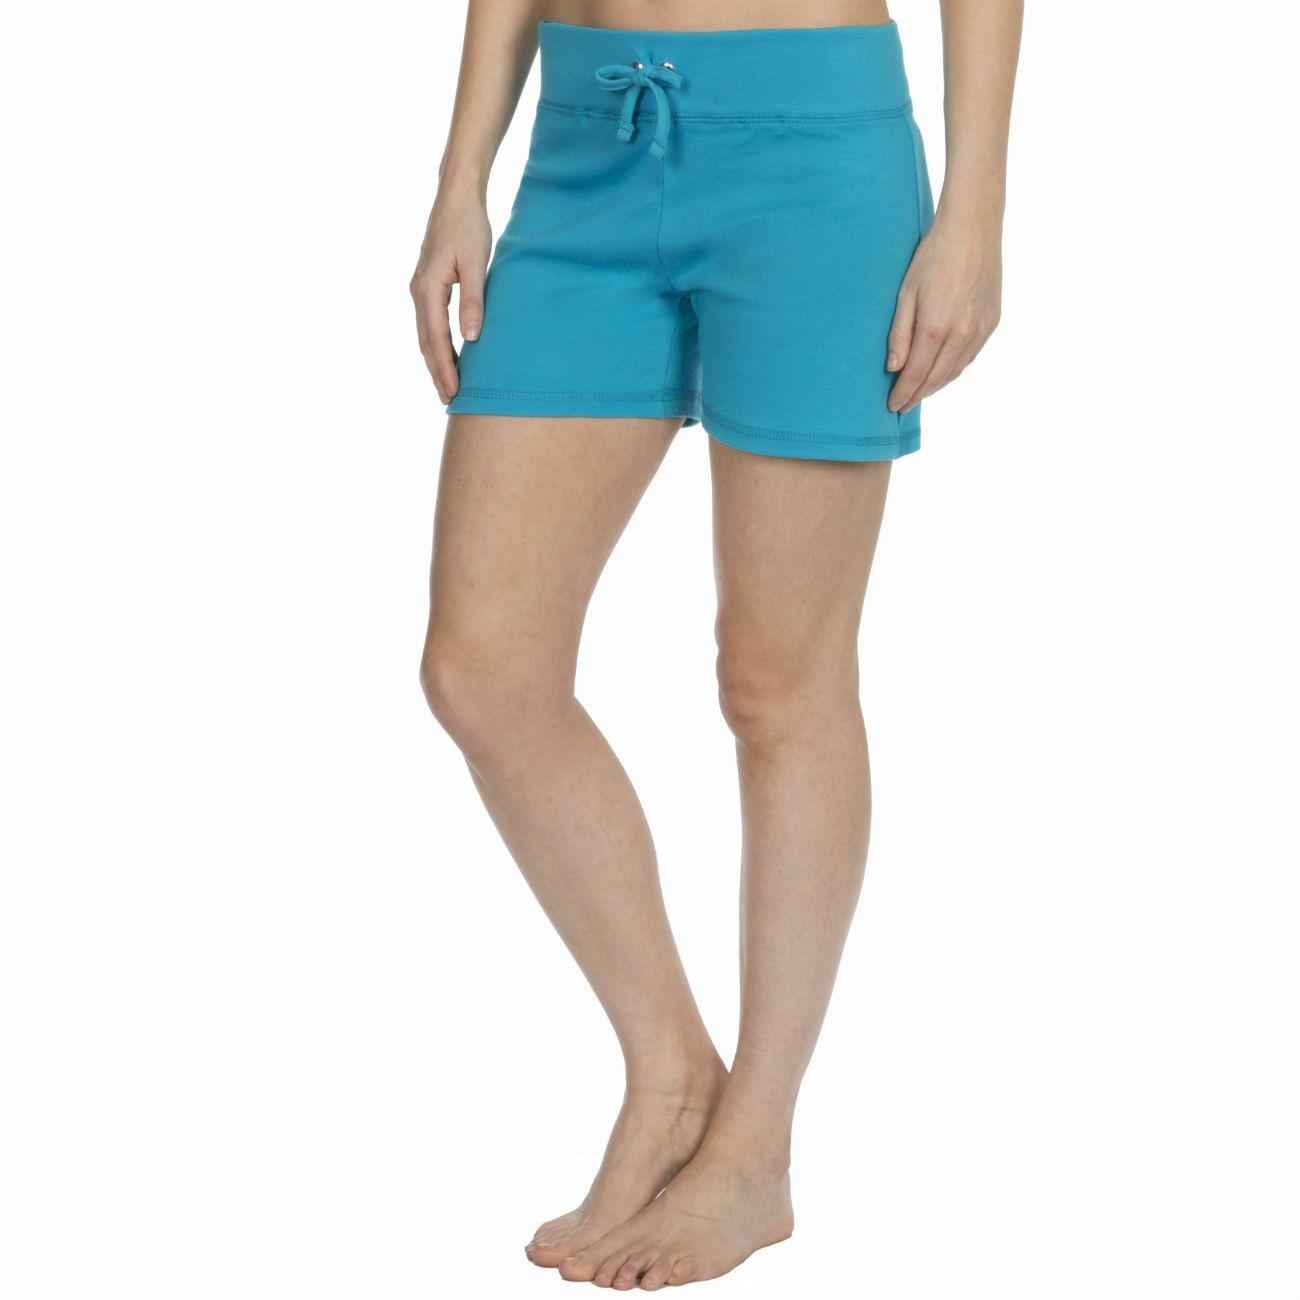 Womens-Cotton-Jersey-Shorts-Elastic-Waist-Summer-Beach-Casual-Yoga-Hot-Pants-New thumbnail 25